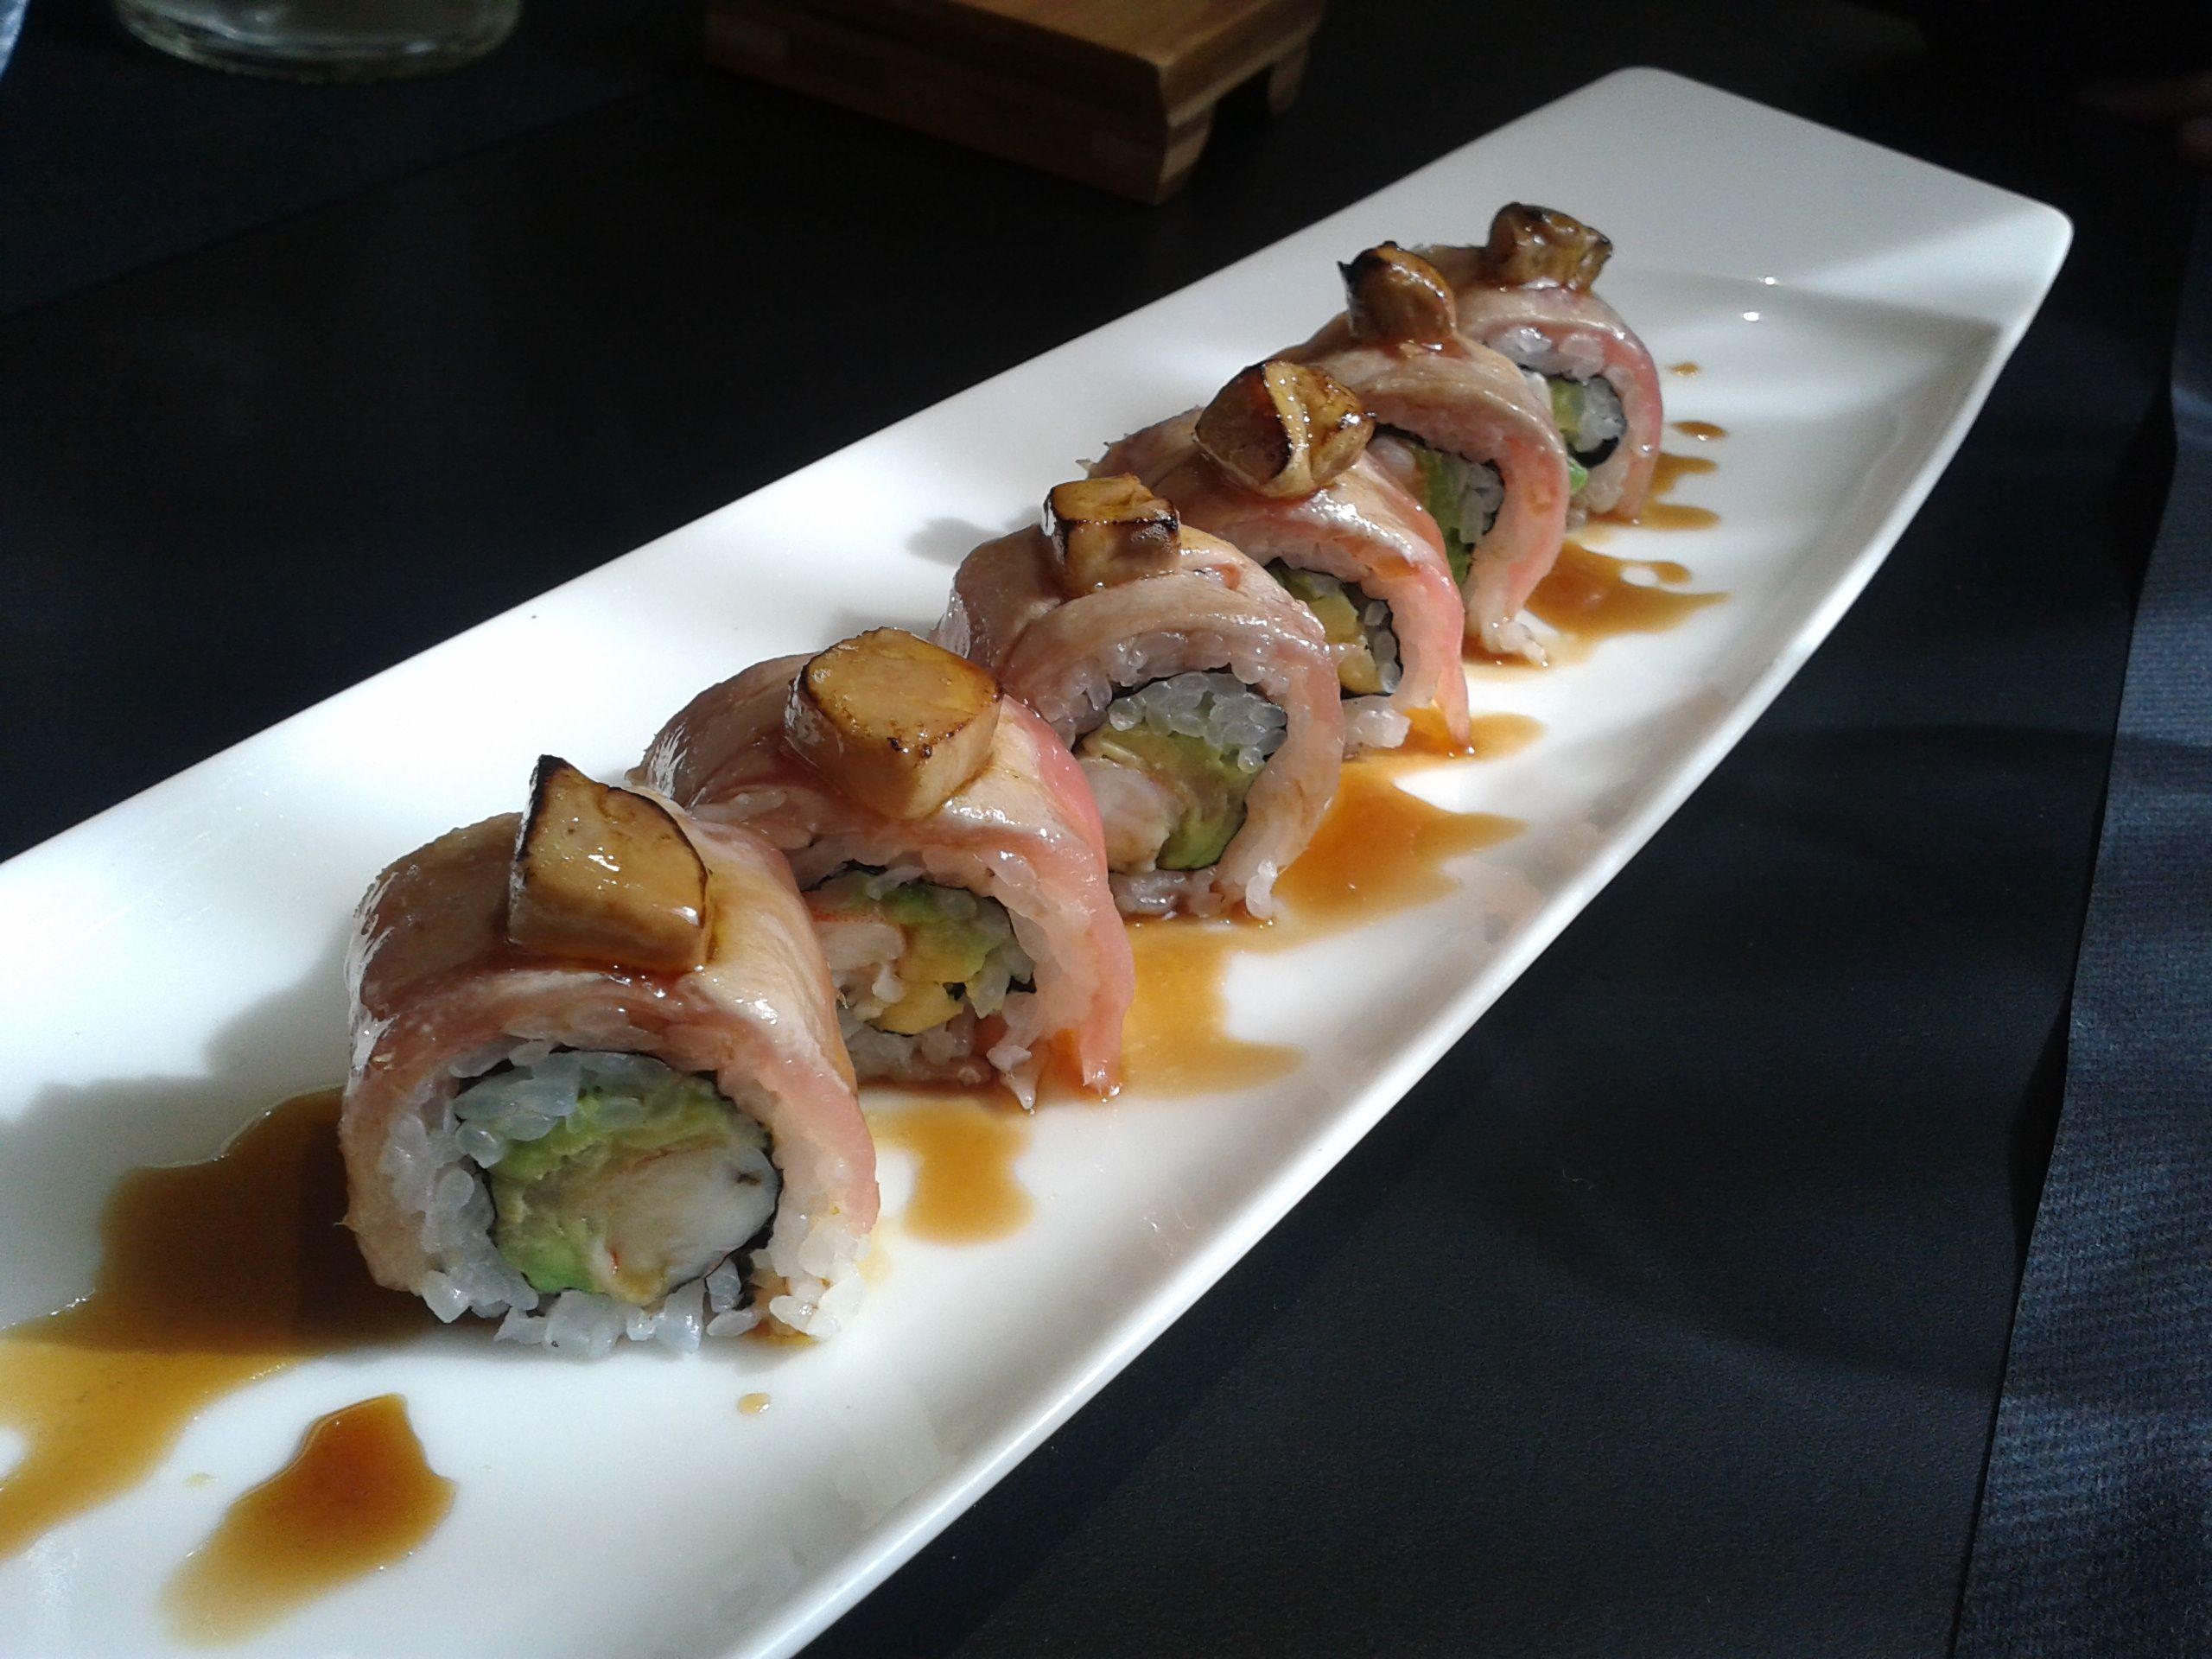 Maki invertido de salmón y foie con salsa de Pedro Jimenez